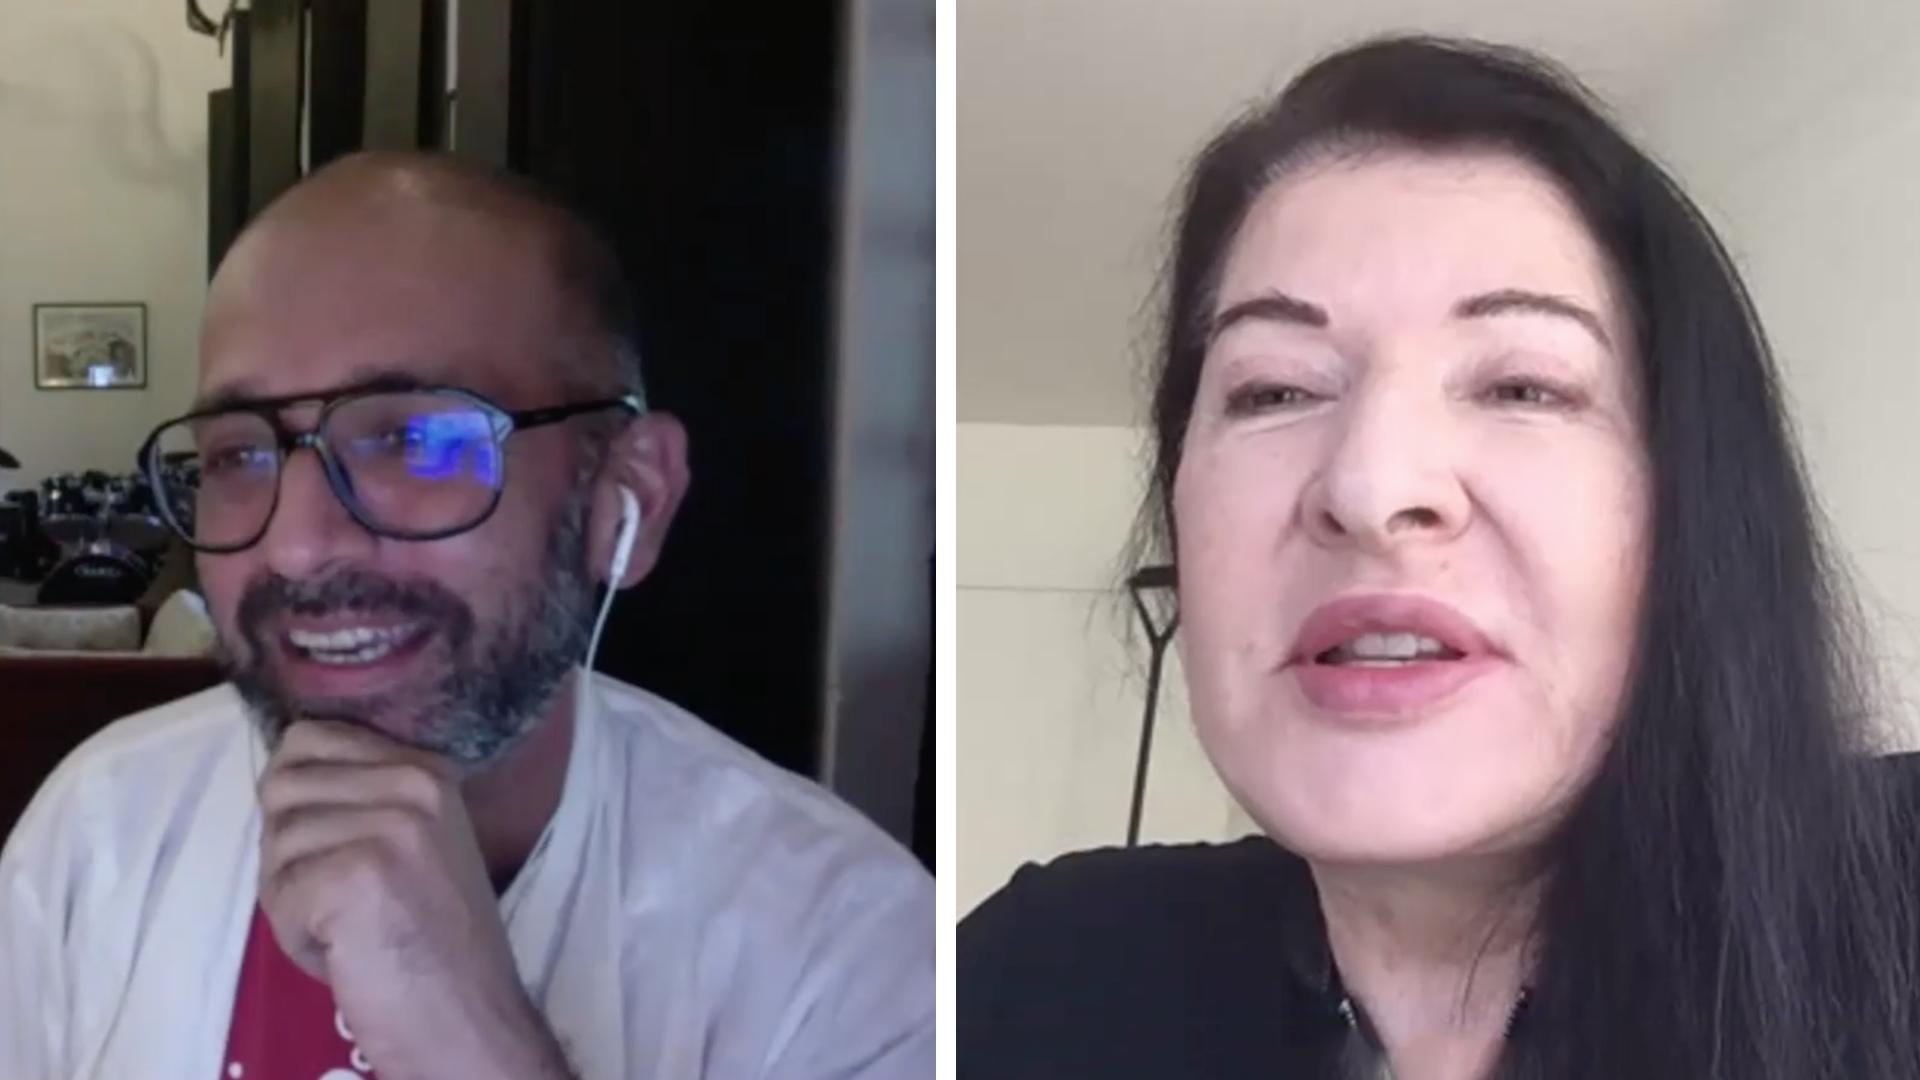 Performance artists Marina Abramović and Nikhil Chopra in a stimulating conversation